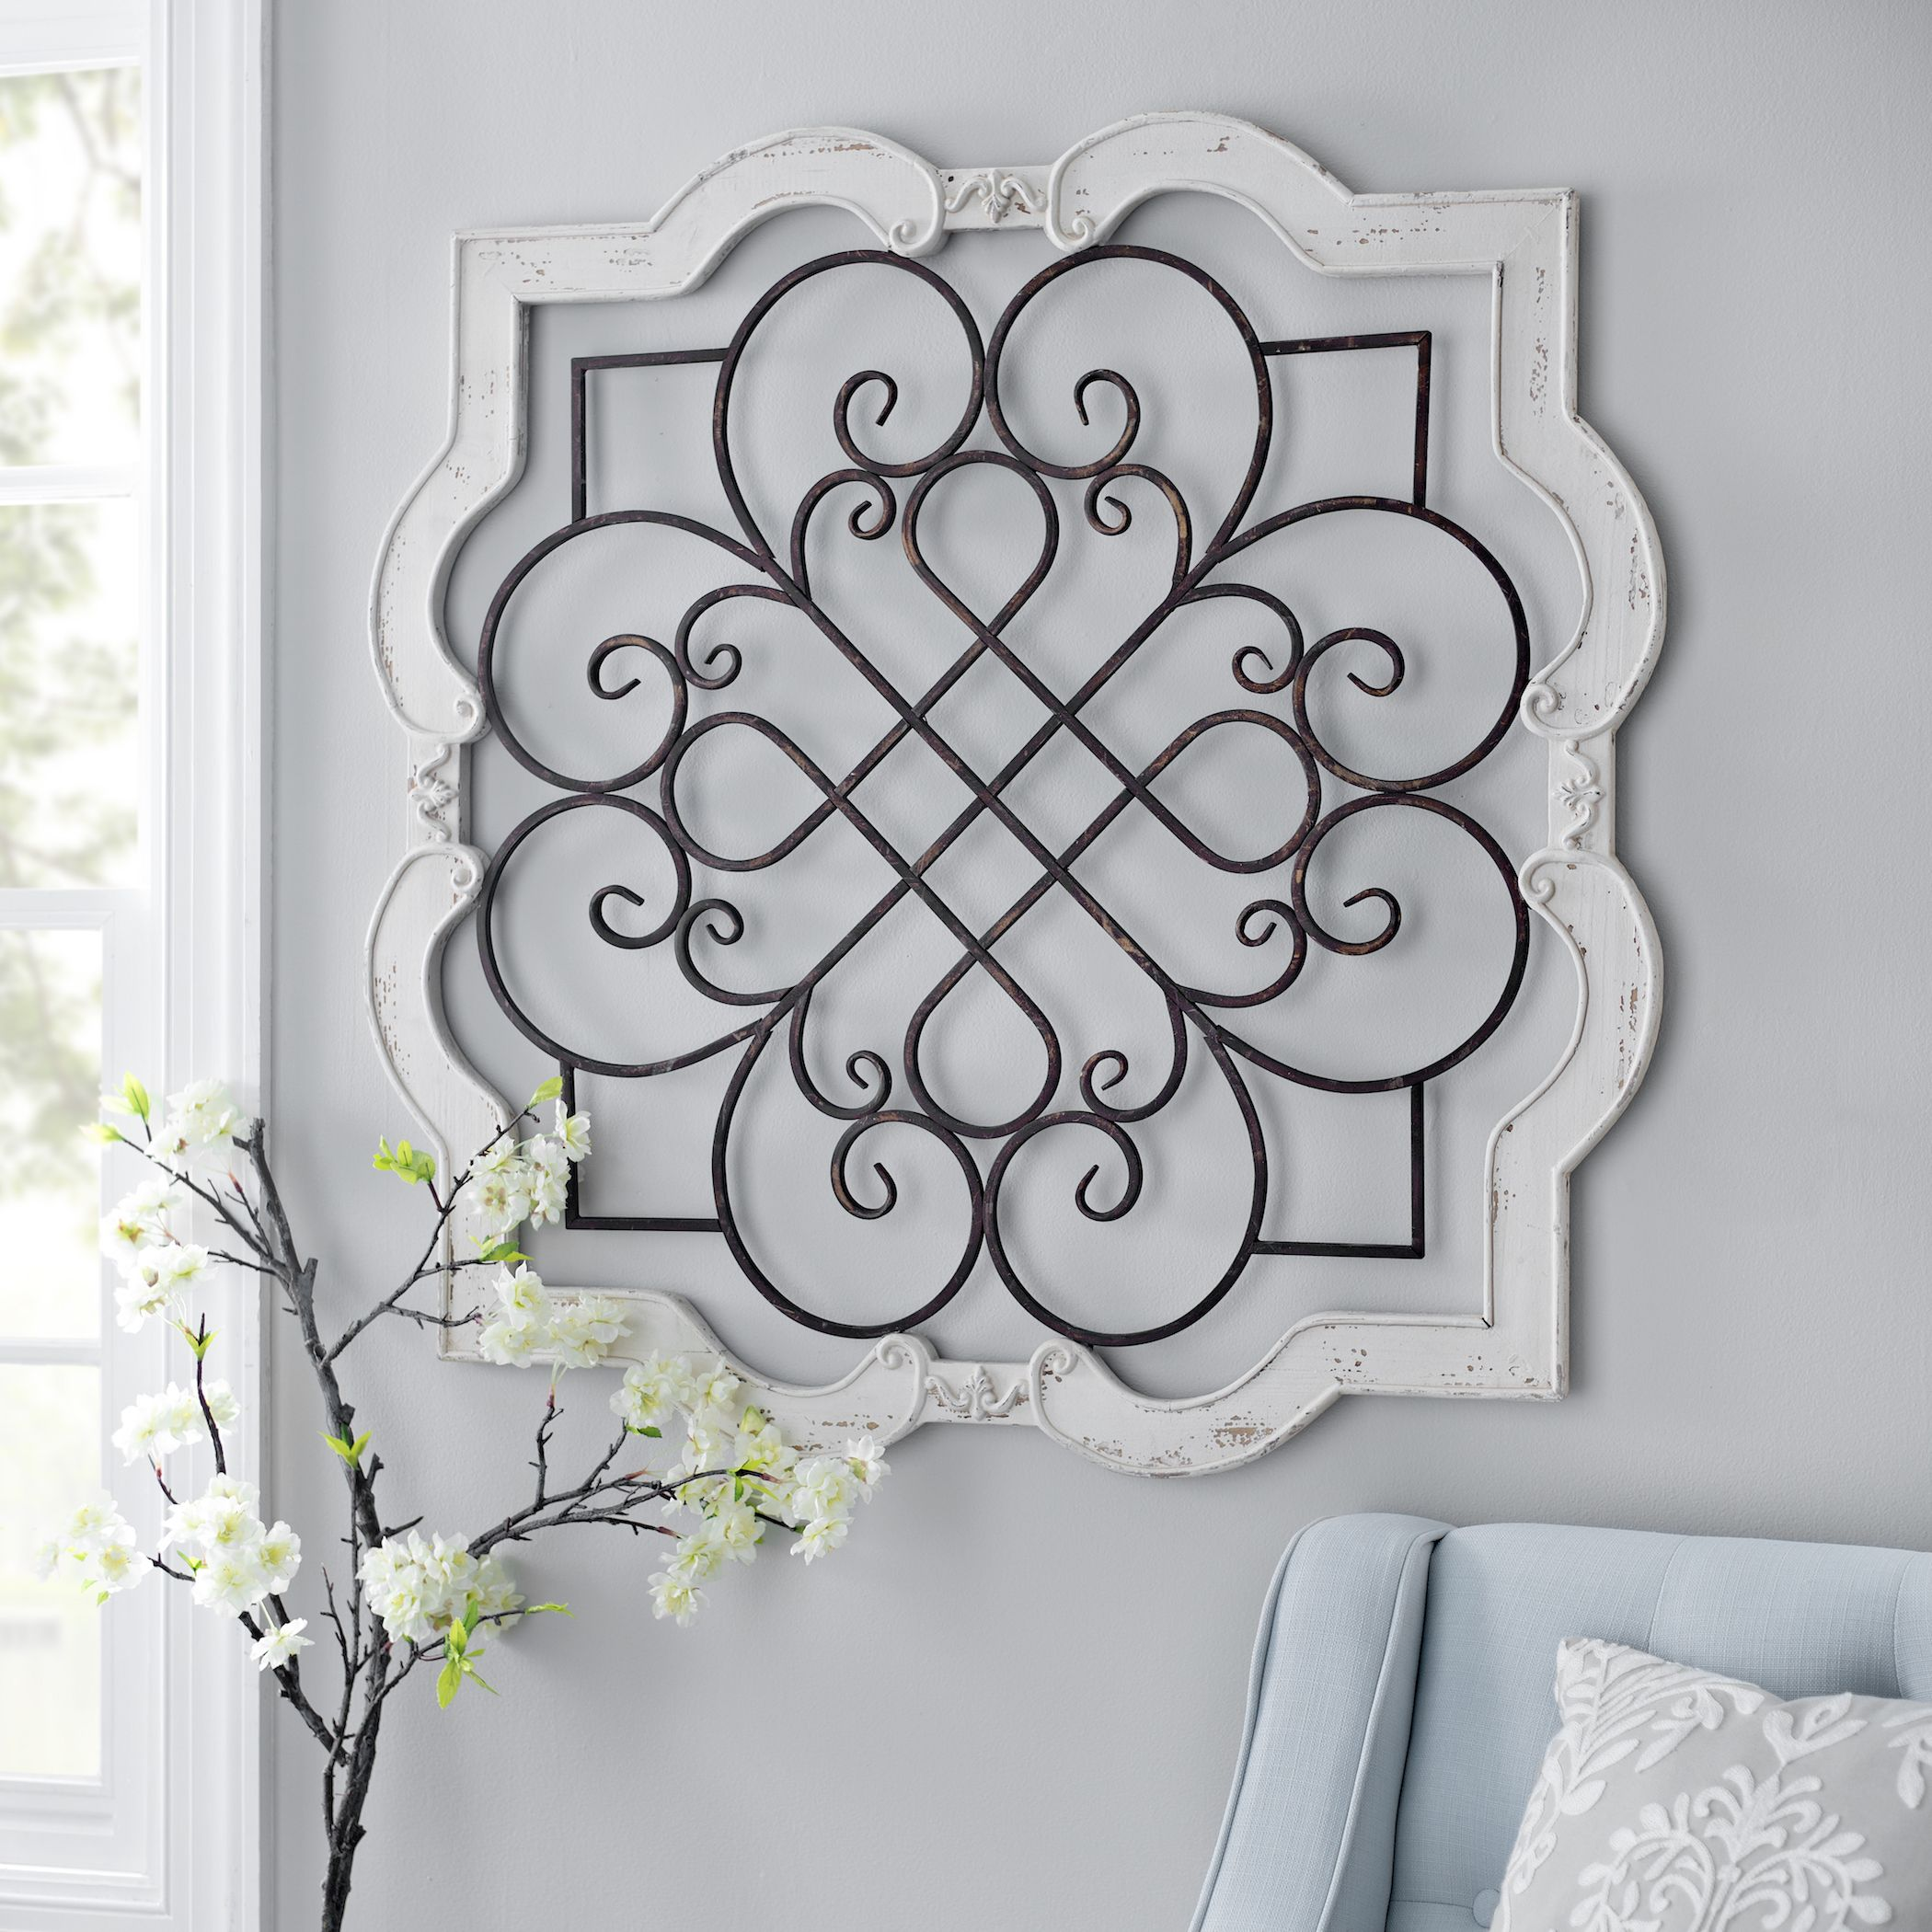 Wood Isabelline Plaque | Kirkland home decor, Farmhouse ... on Kirkland's Decor Home Accents id=27027